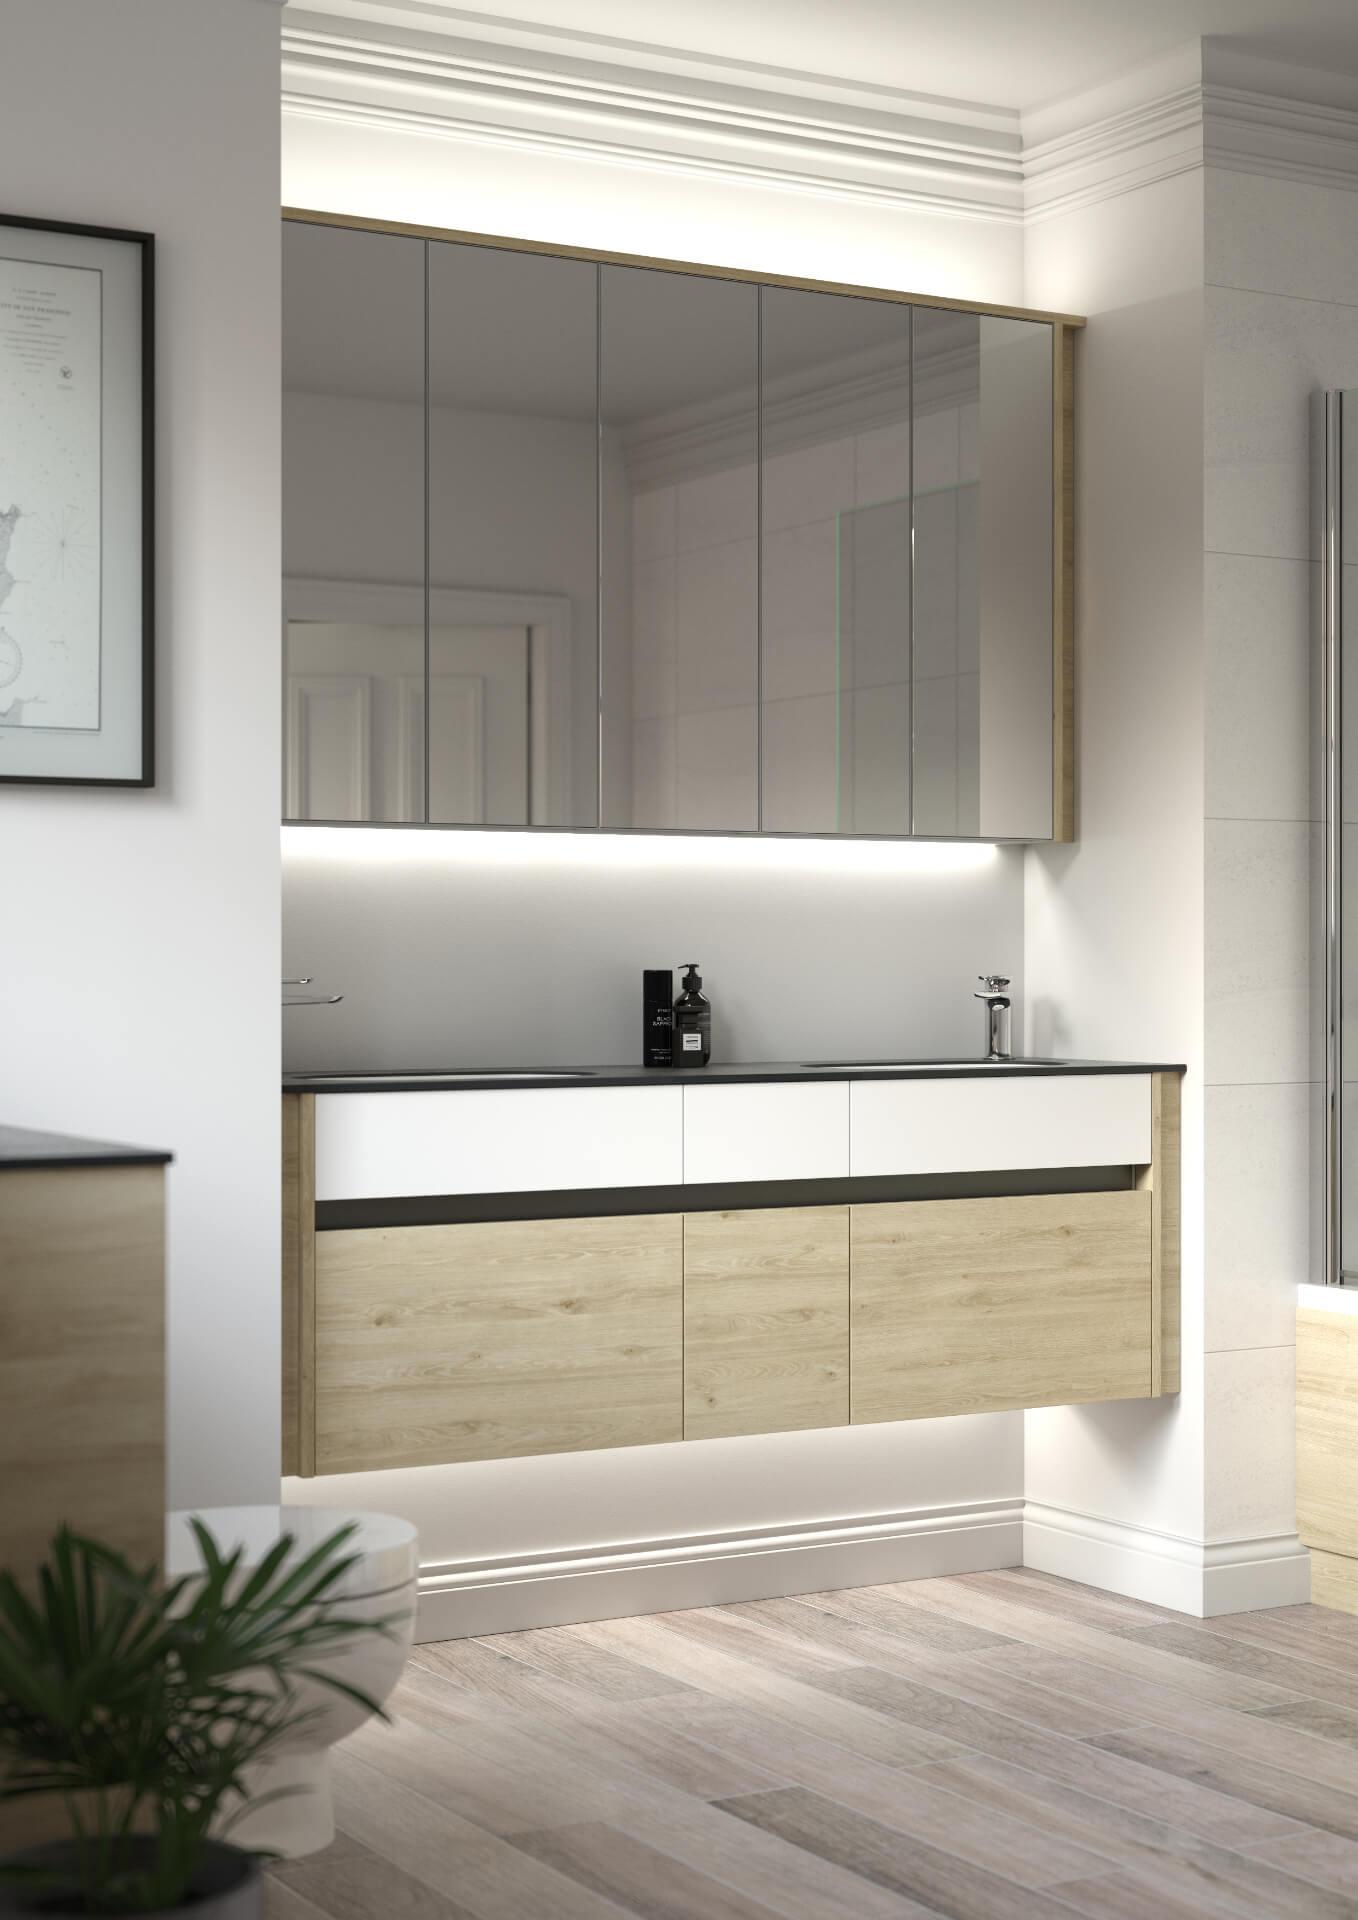 Utopia Bathroom Contemporary Fitted Bathroom Cabinet